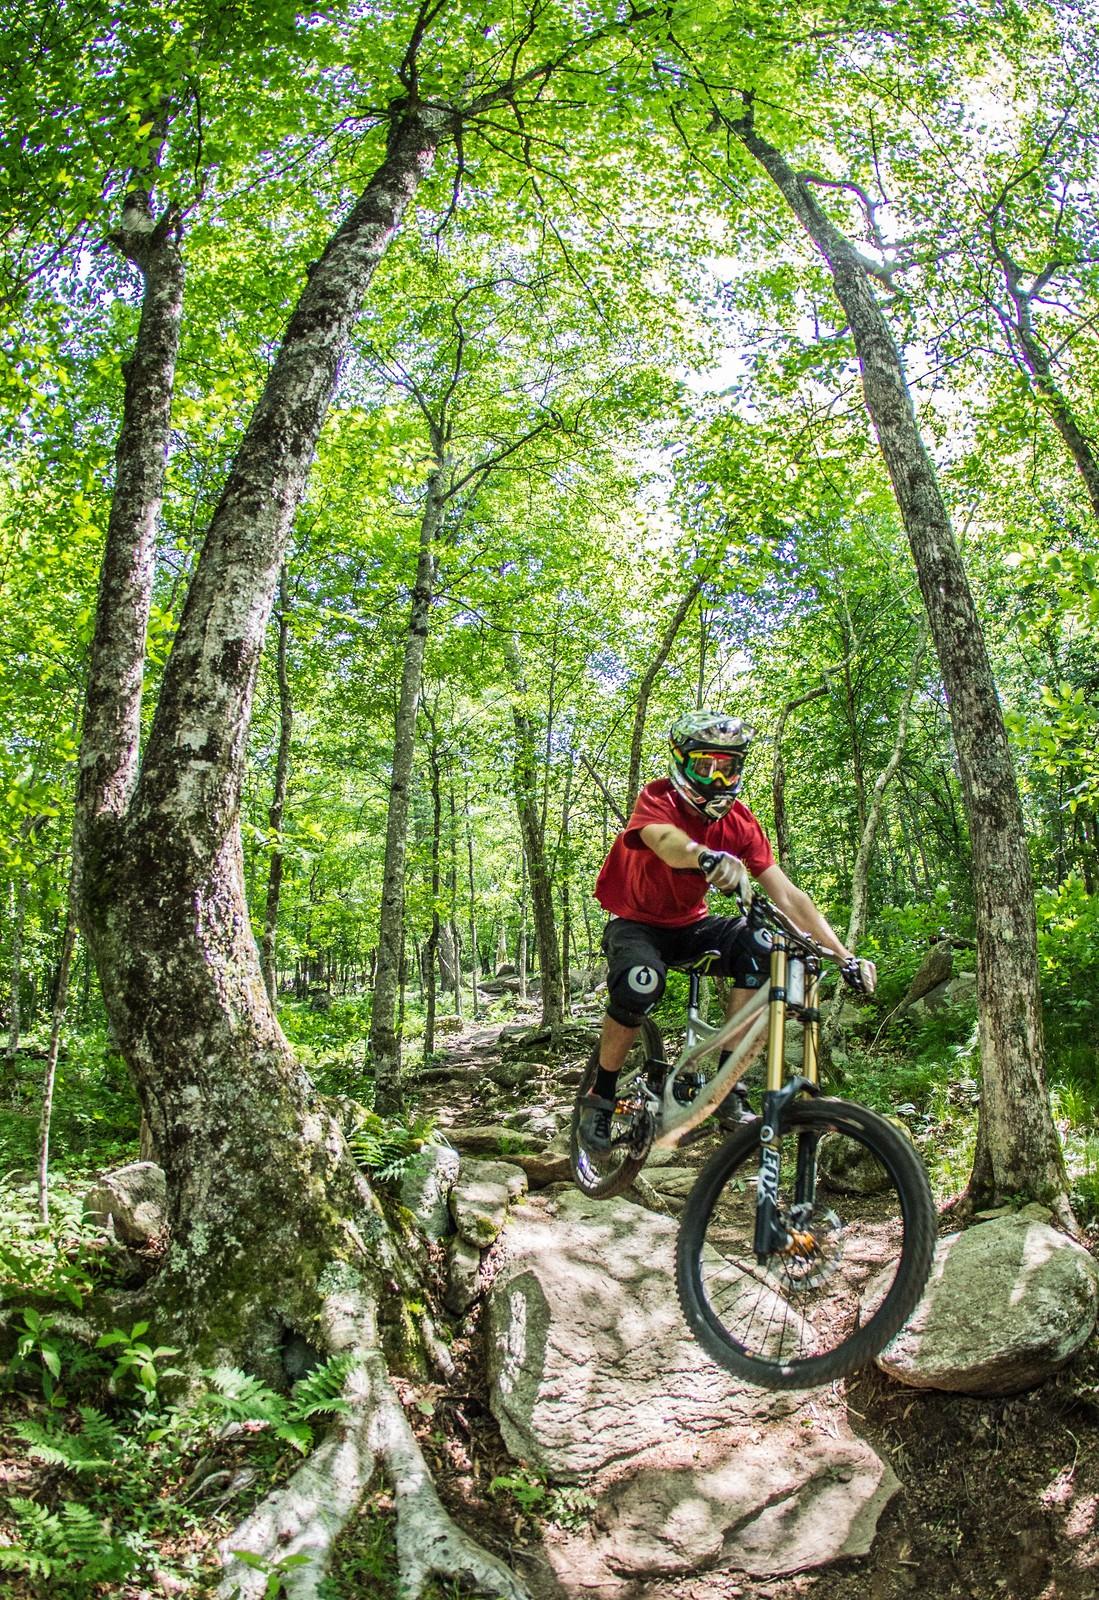 IMG 3470 - mtndrew - Mountain Biking Pictures - Vital MTB